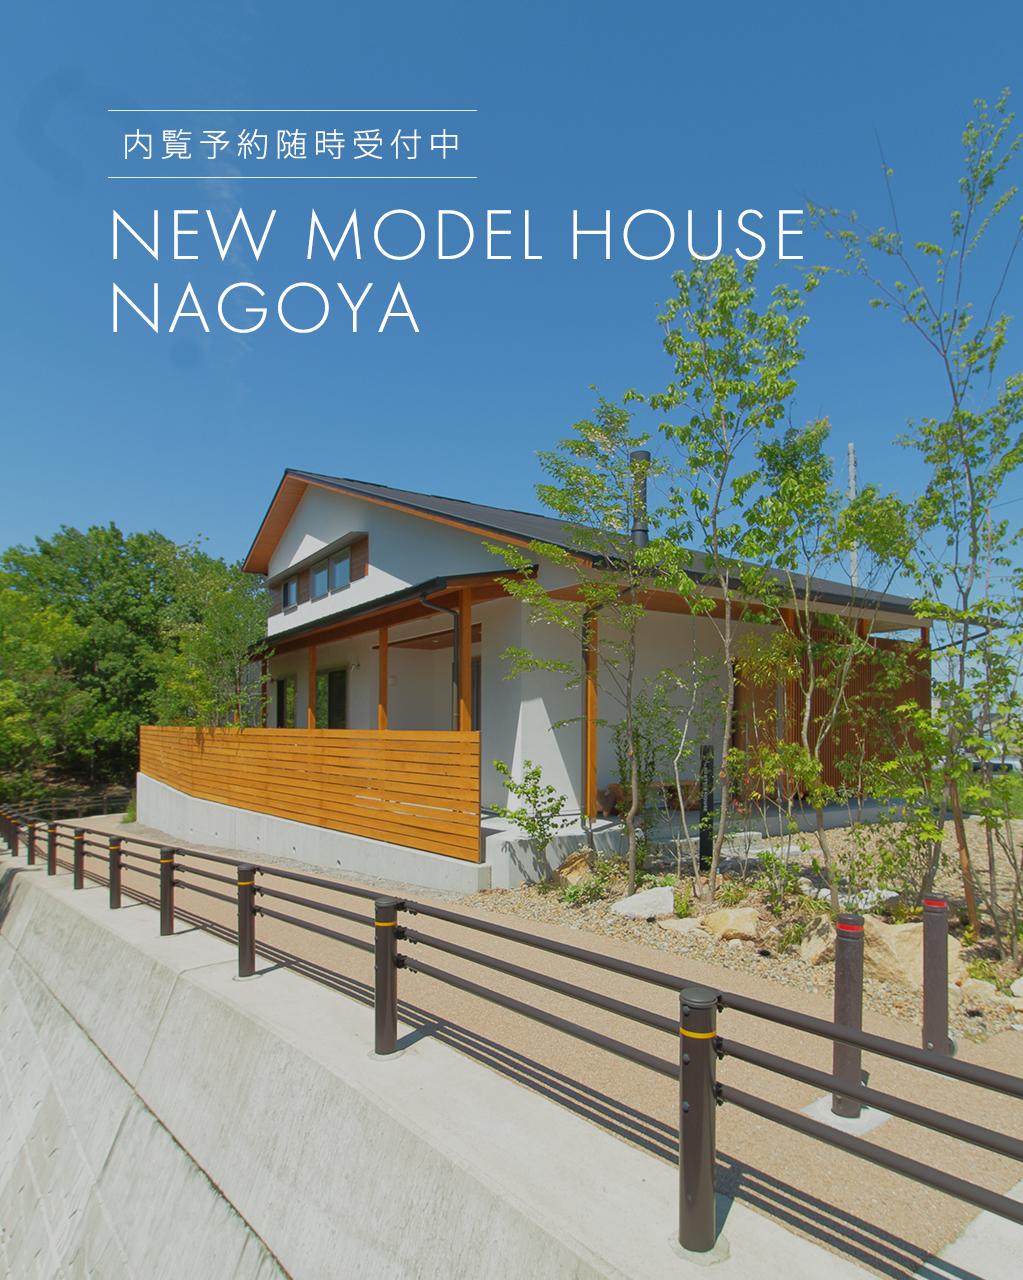 NEW MODEL HOUSE NAGOYA内覧受付中(SP)